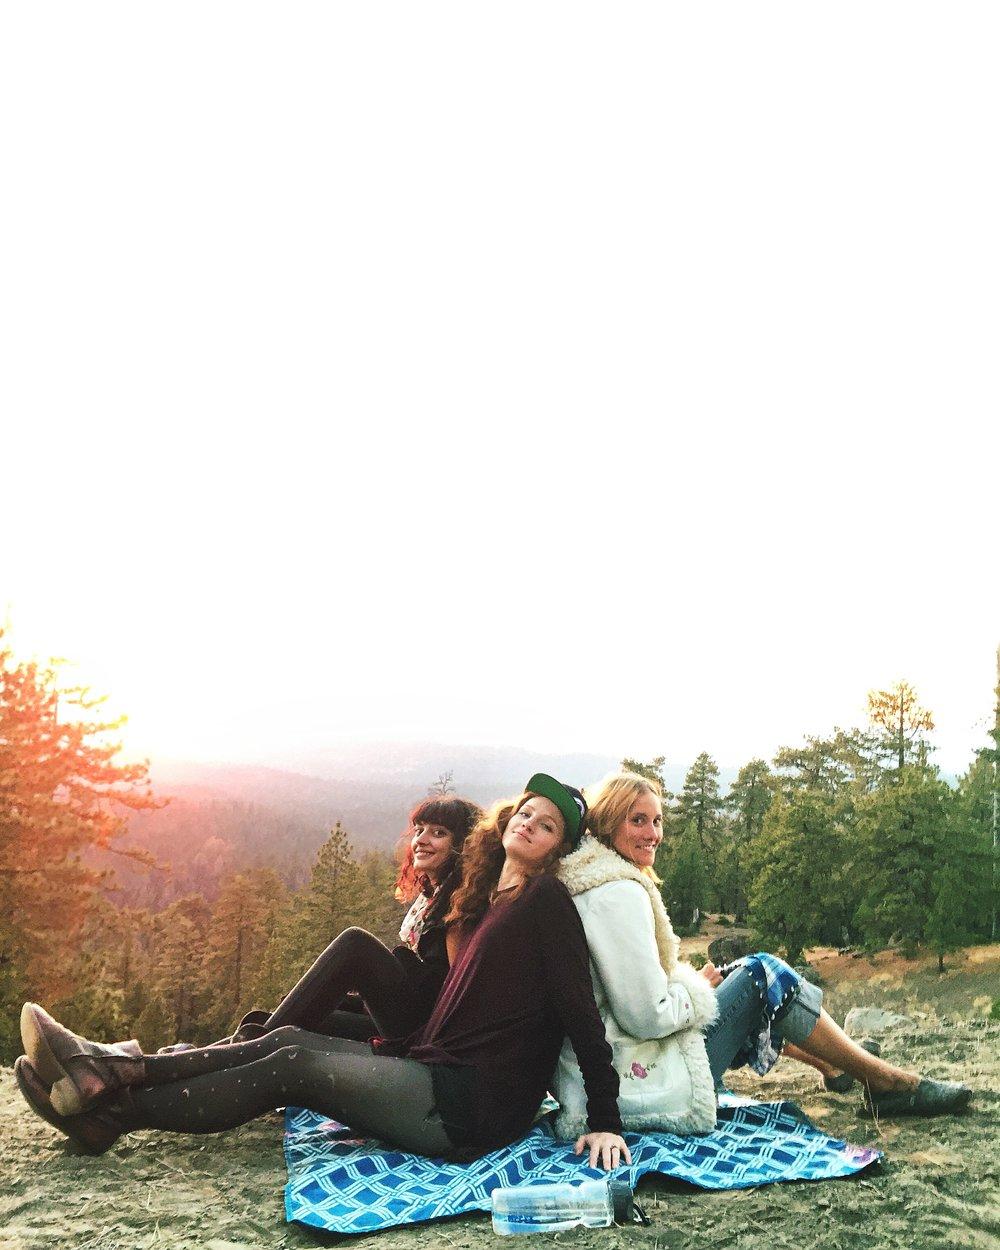 MENNA, April & Mouse Enjoying a Therapy Sunset